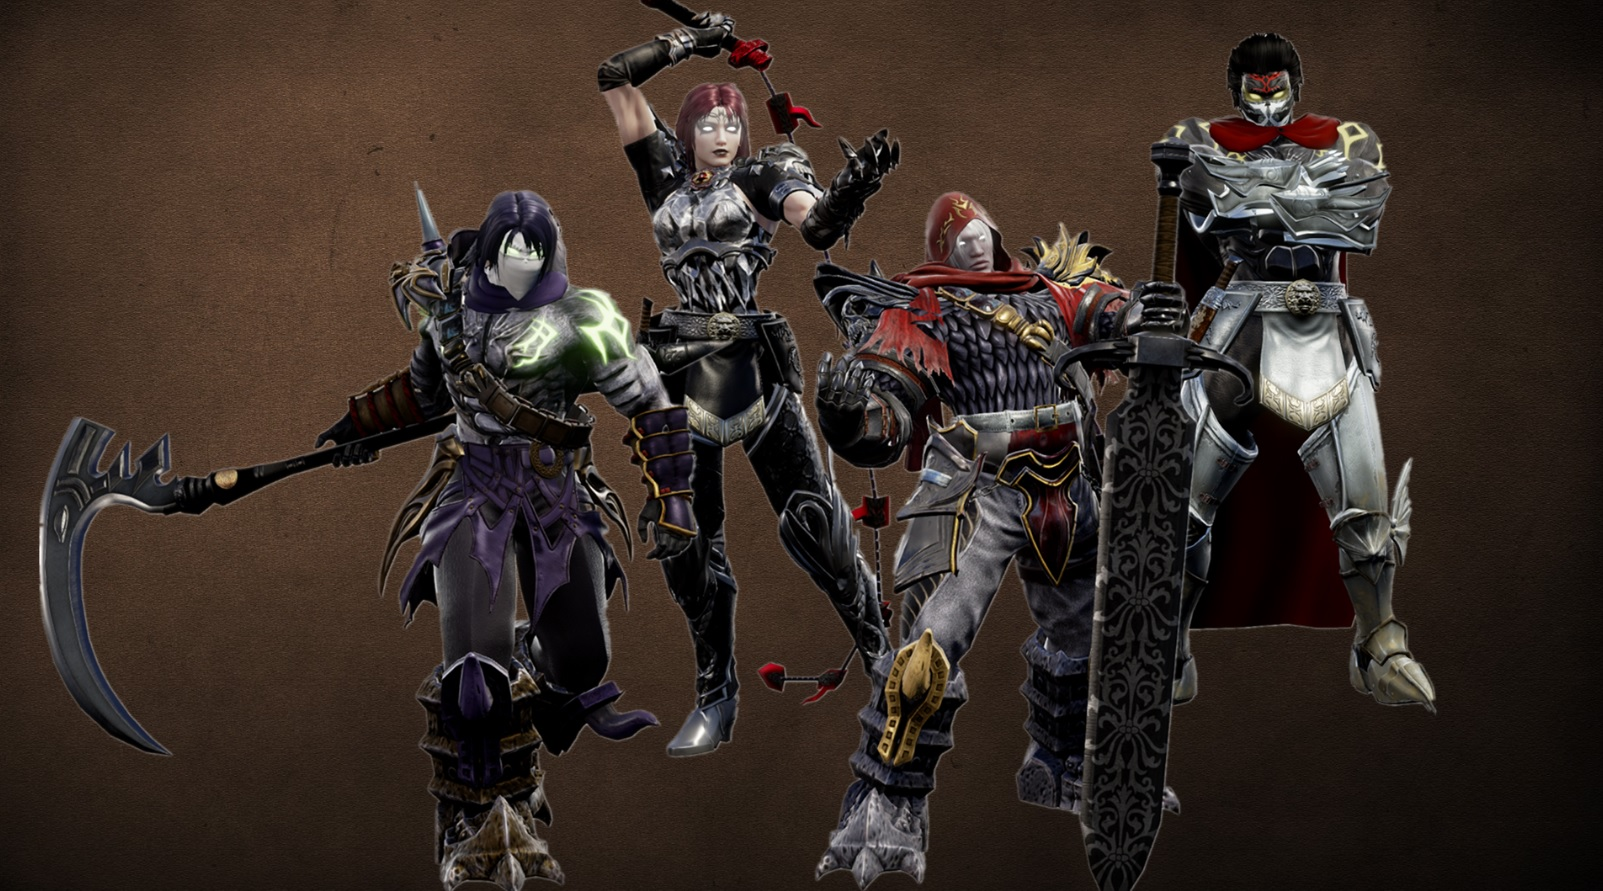 Someone made Darksiders' Four Horsemen in Soulcalibur VI